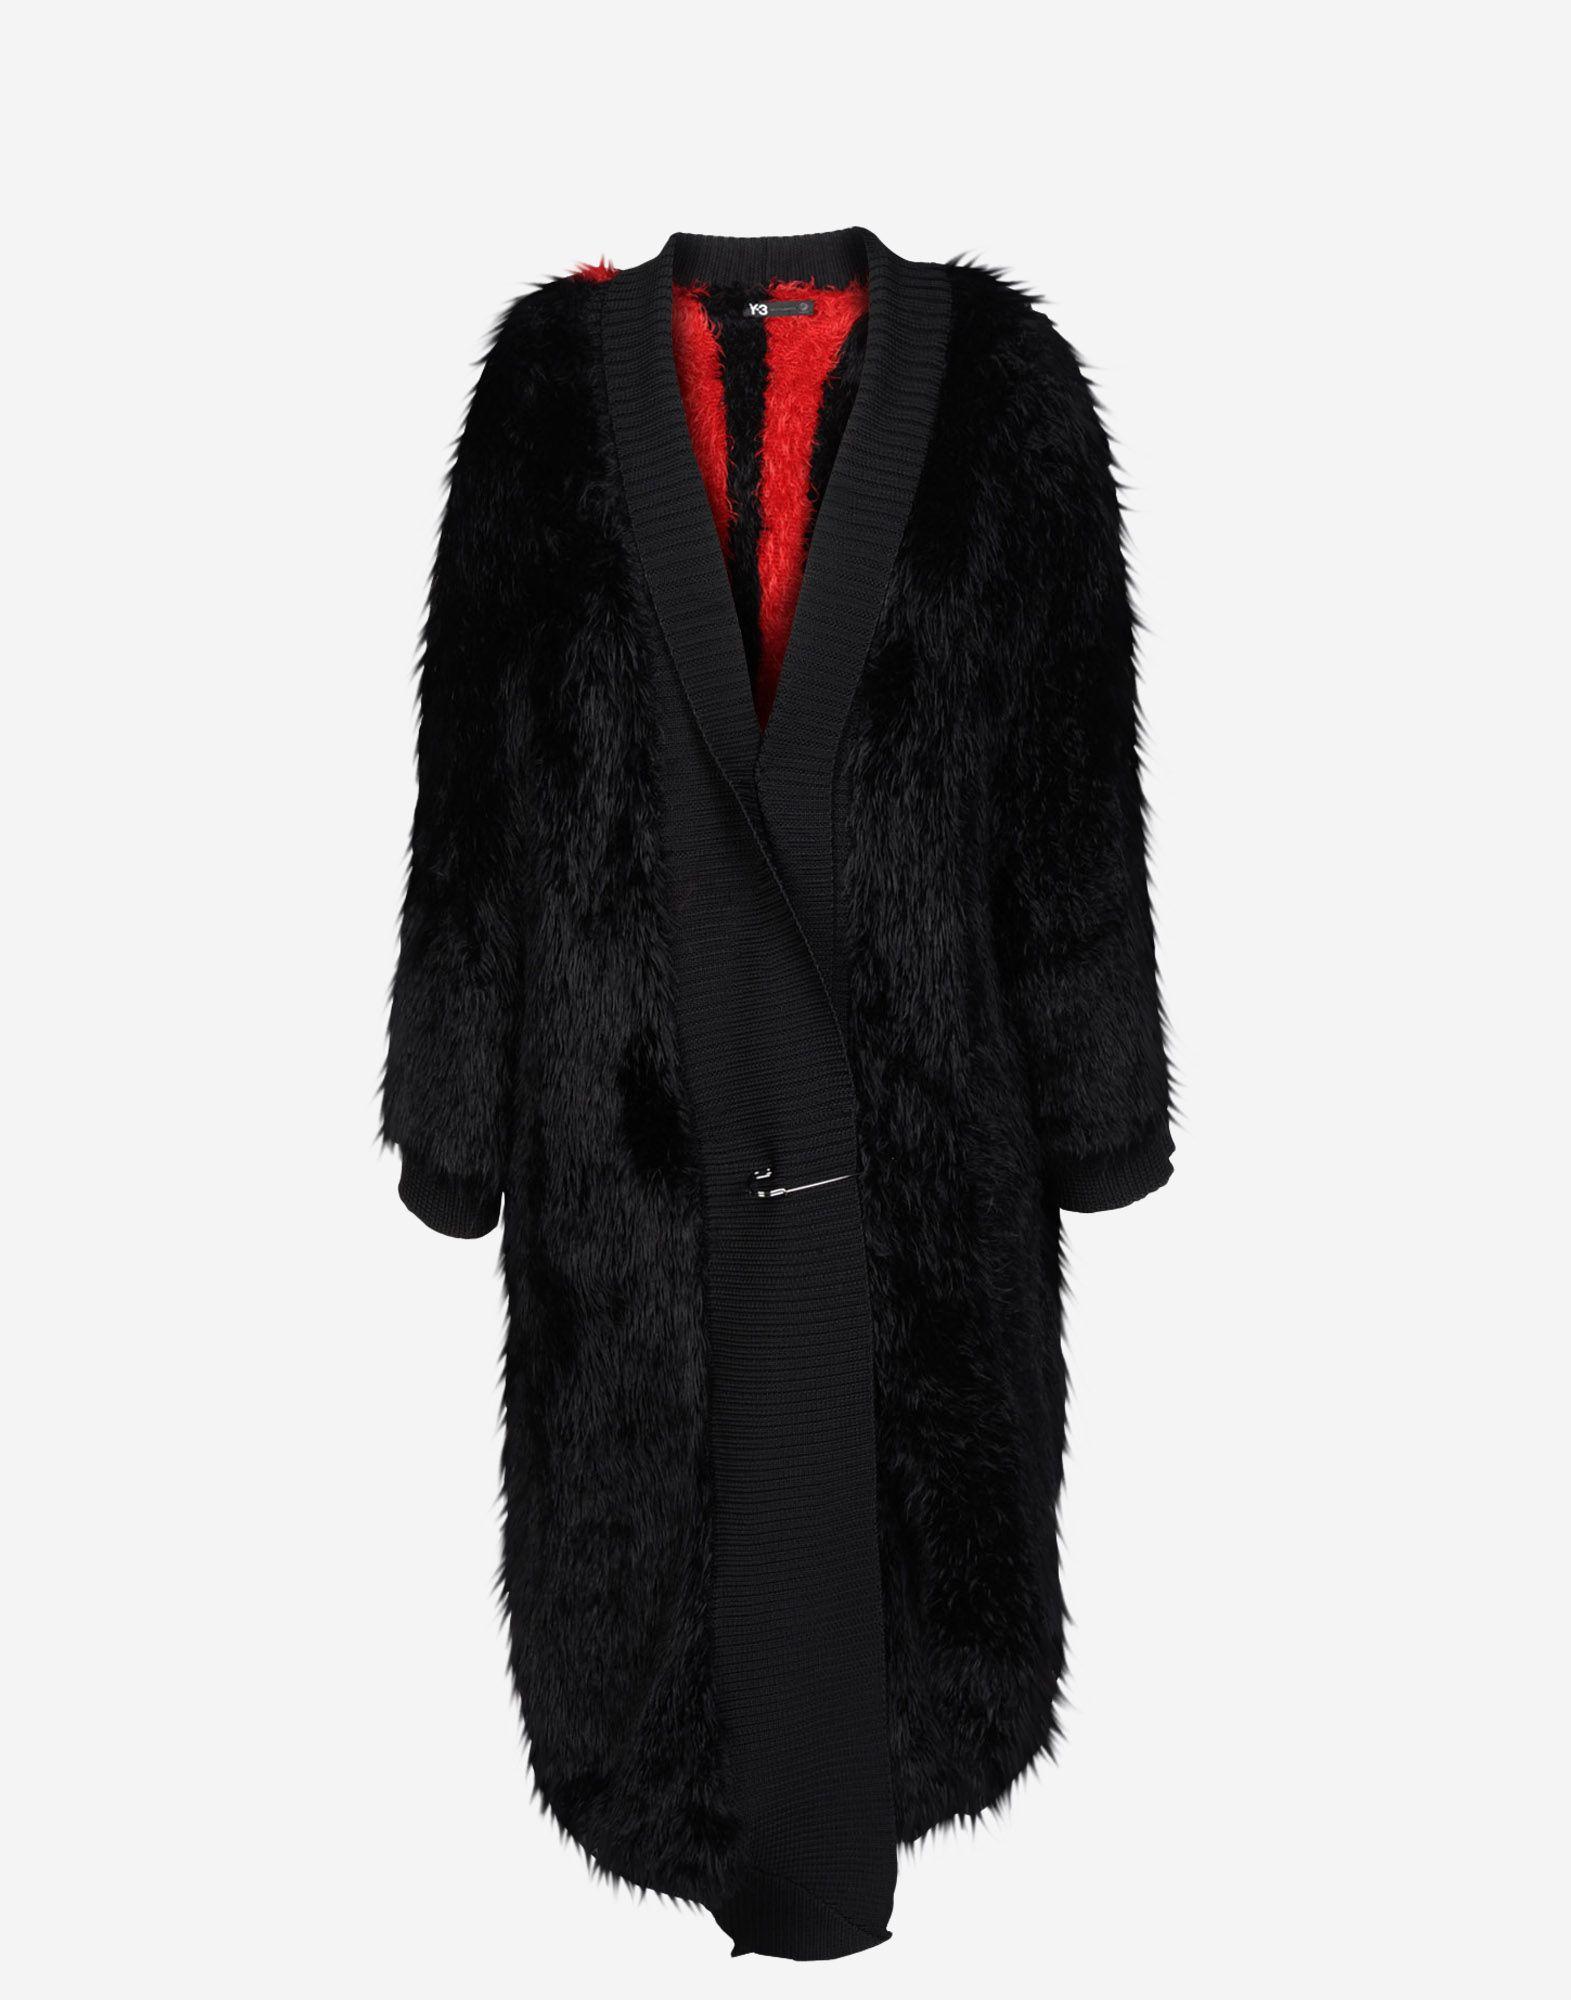 Coats Y 3 Fur Knit Coat for Women